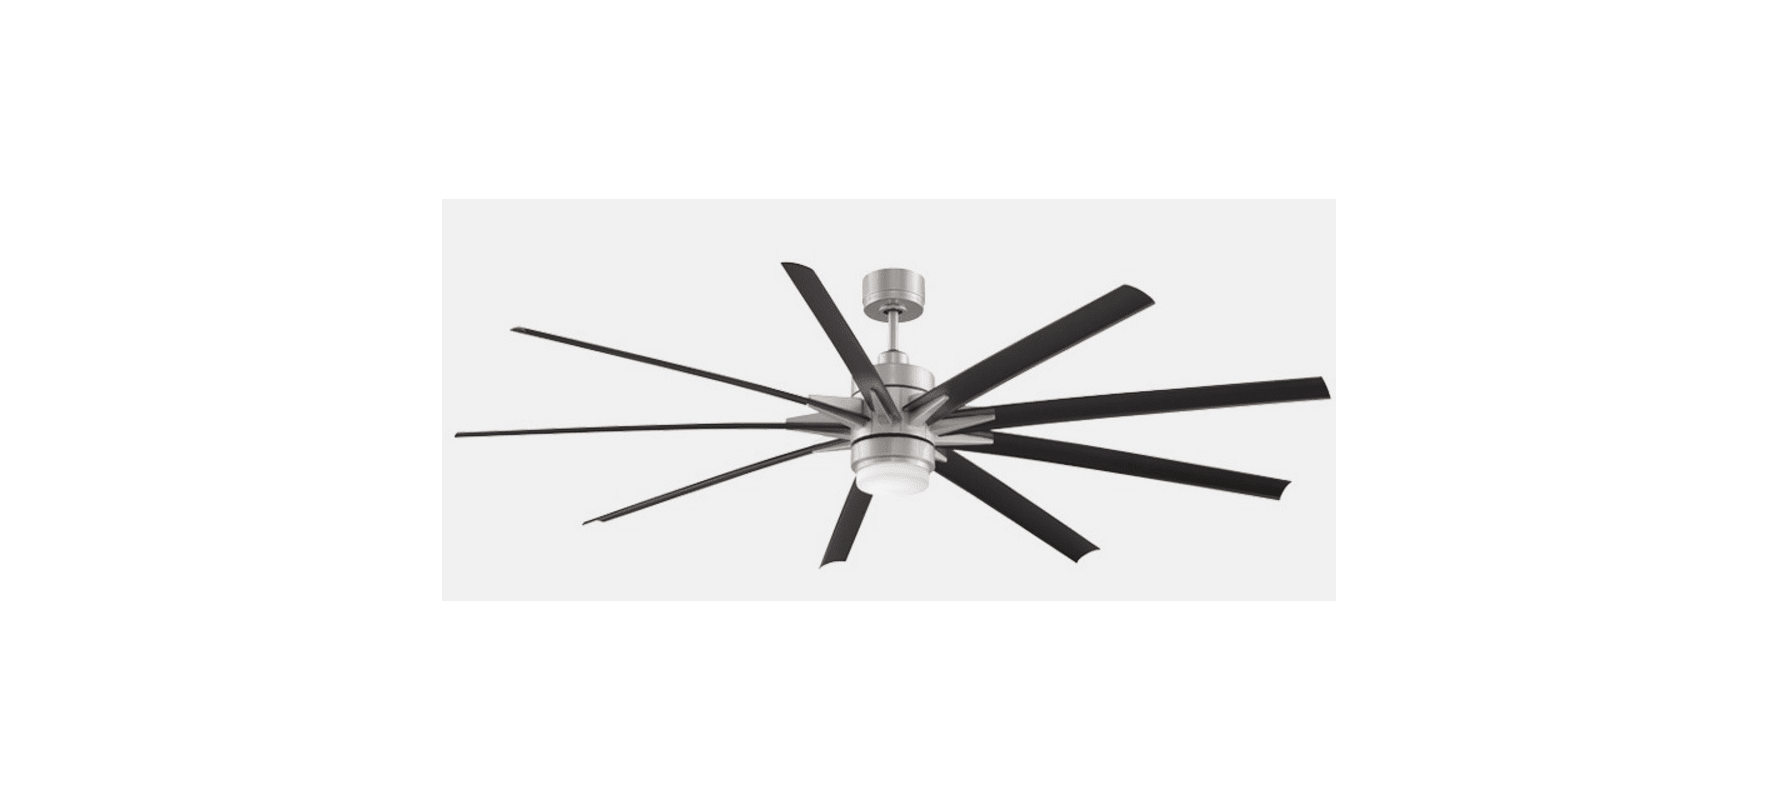 84 Fanimation Odyn 9 Blade Led Ceiling Fan W Remote Amp Light Kit Brushed Nickel